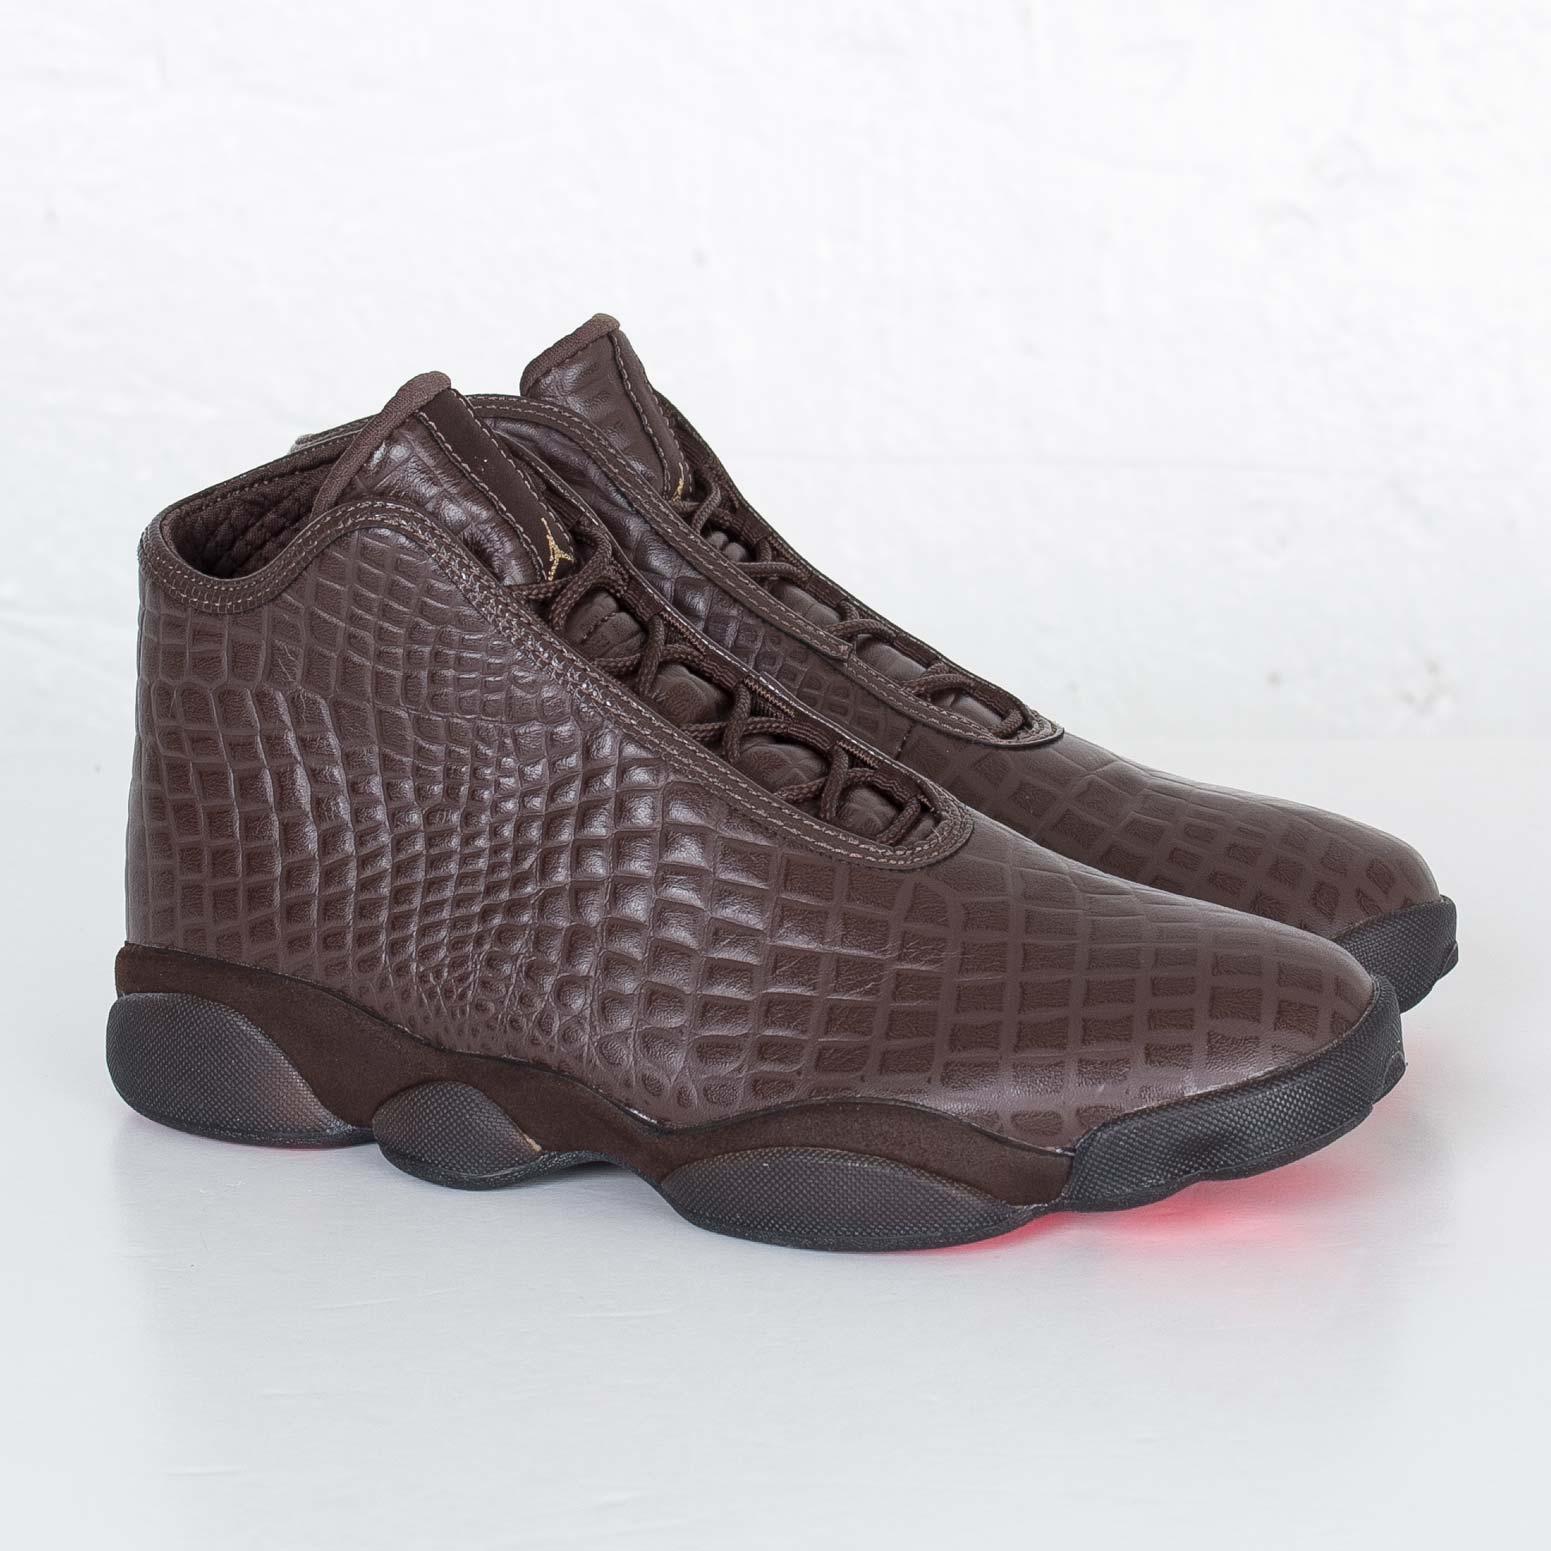 ad937aa3d2a Jordan Brand Jordan Horizon Premium - 822333-205 - Sneakersnstuff ...